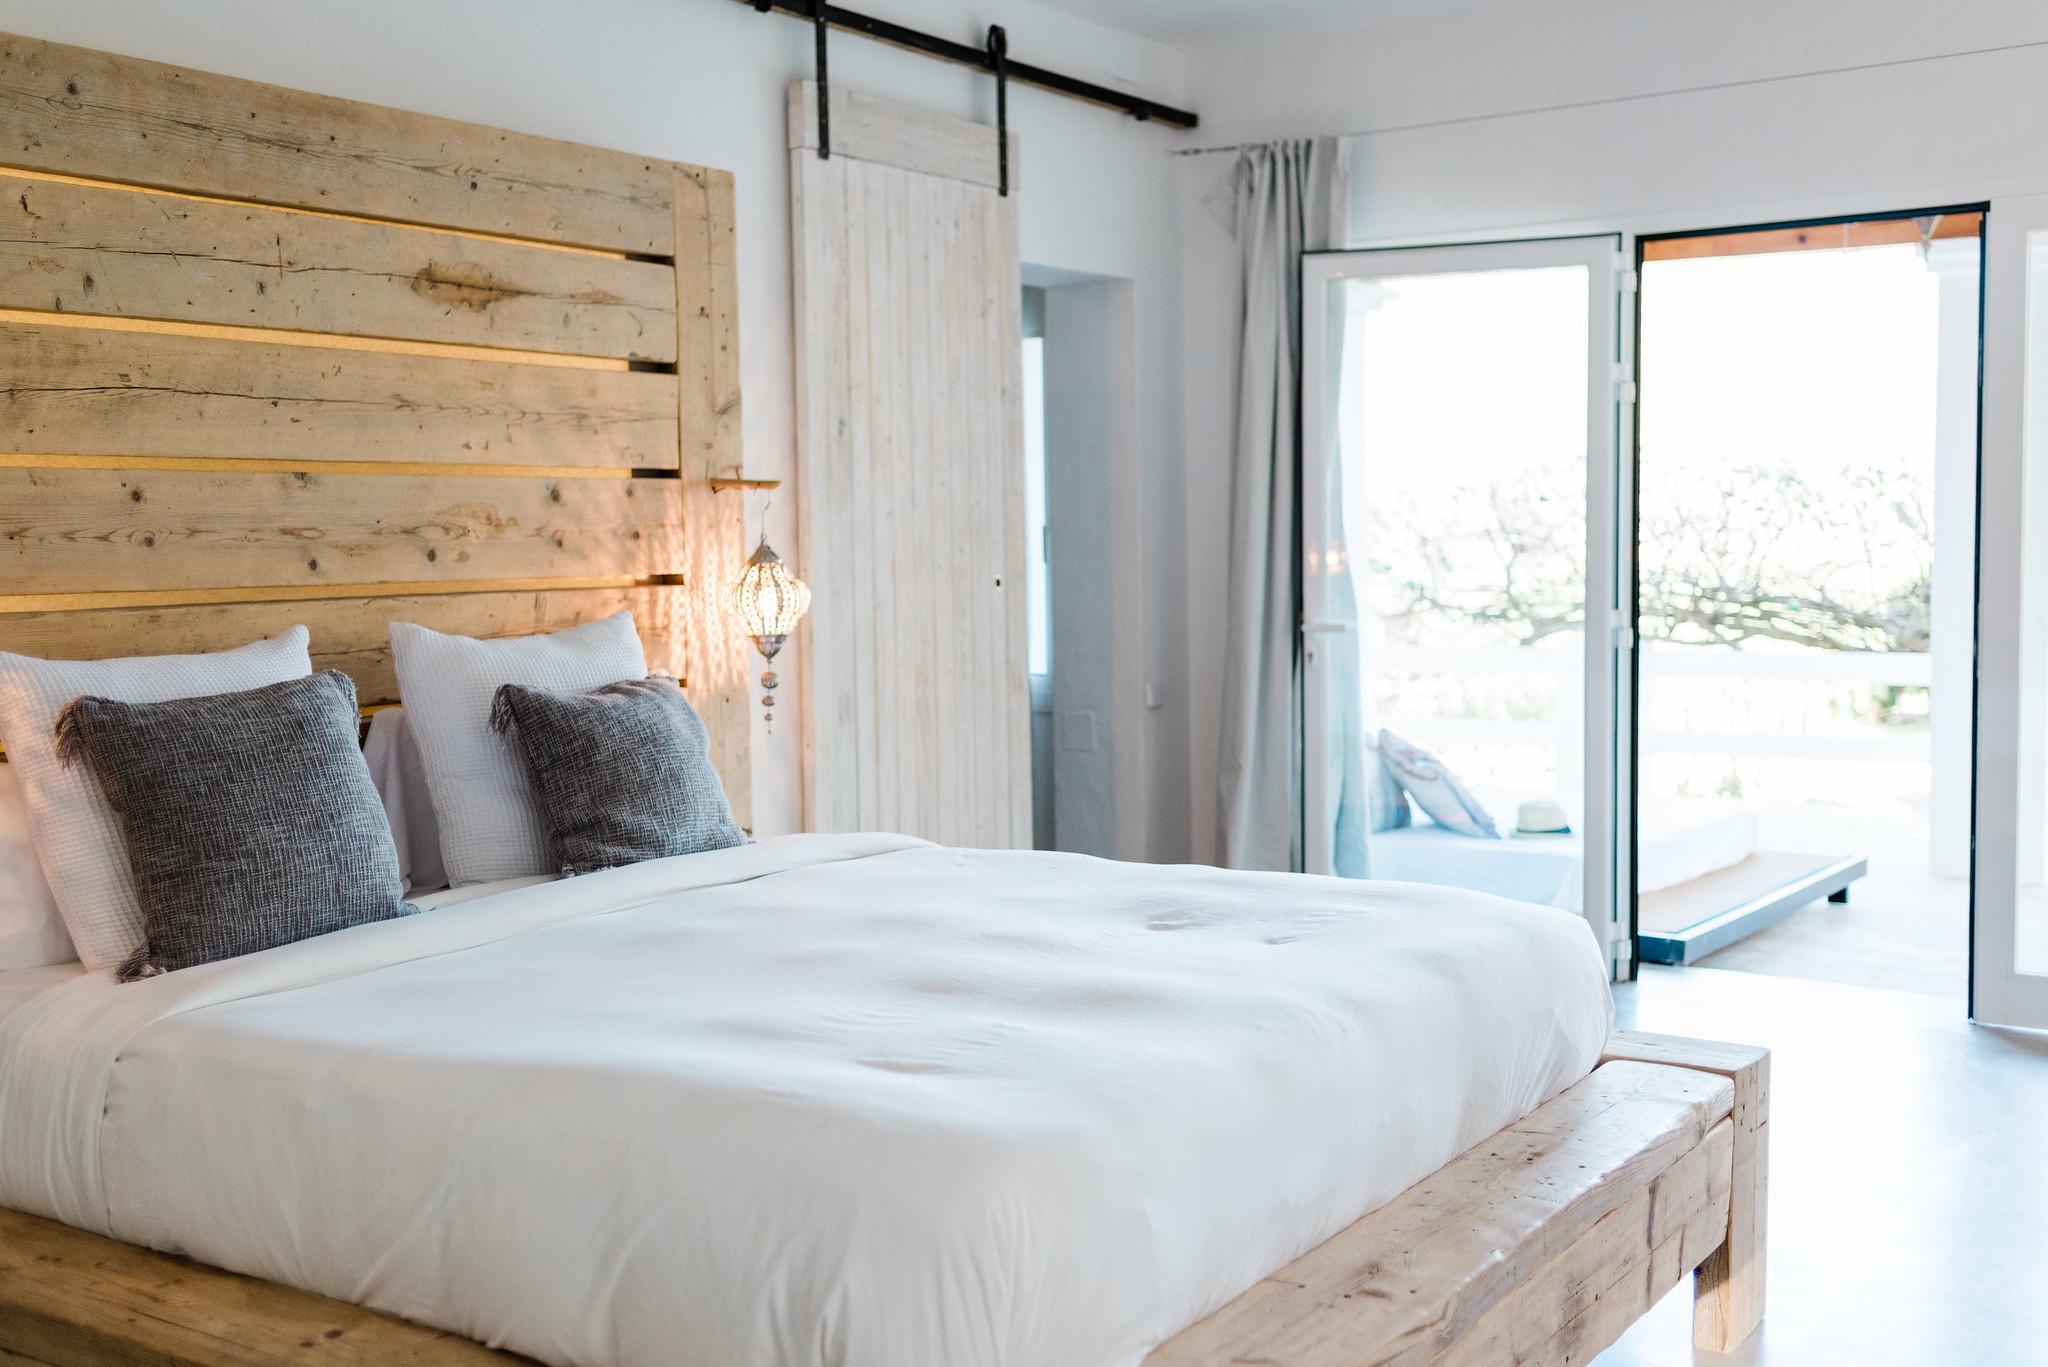 https://www.white-ibiza.com/wp-content/uploads/2020/05/white-ibiza-villas-can-verde-interior-master2.jpg